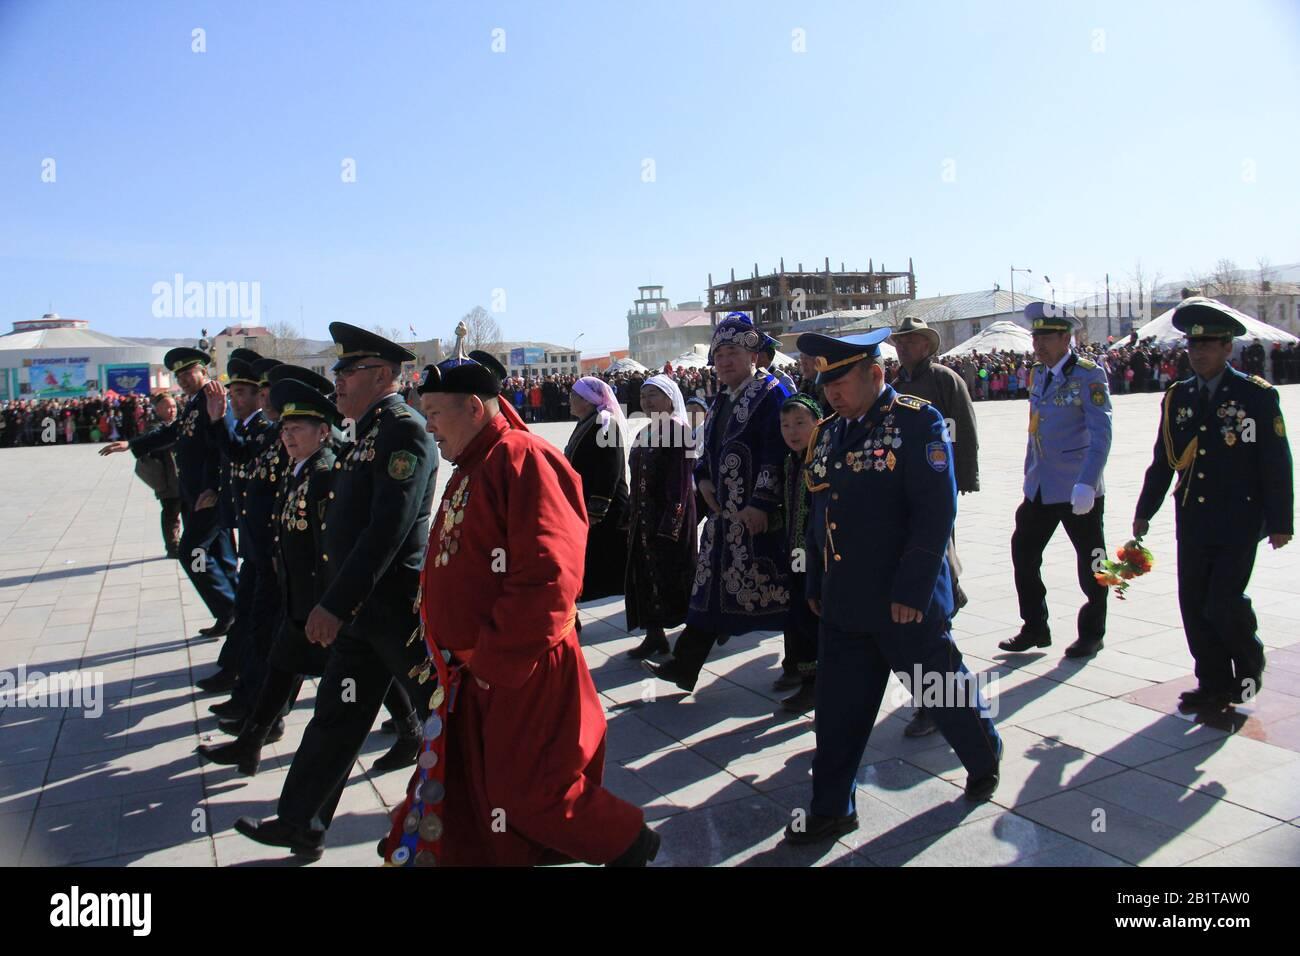 Nauryz festival in Bayan Ulgii province at Western Mongolia. Kazakh nomads traditional festival Stock Photo